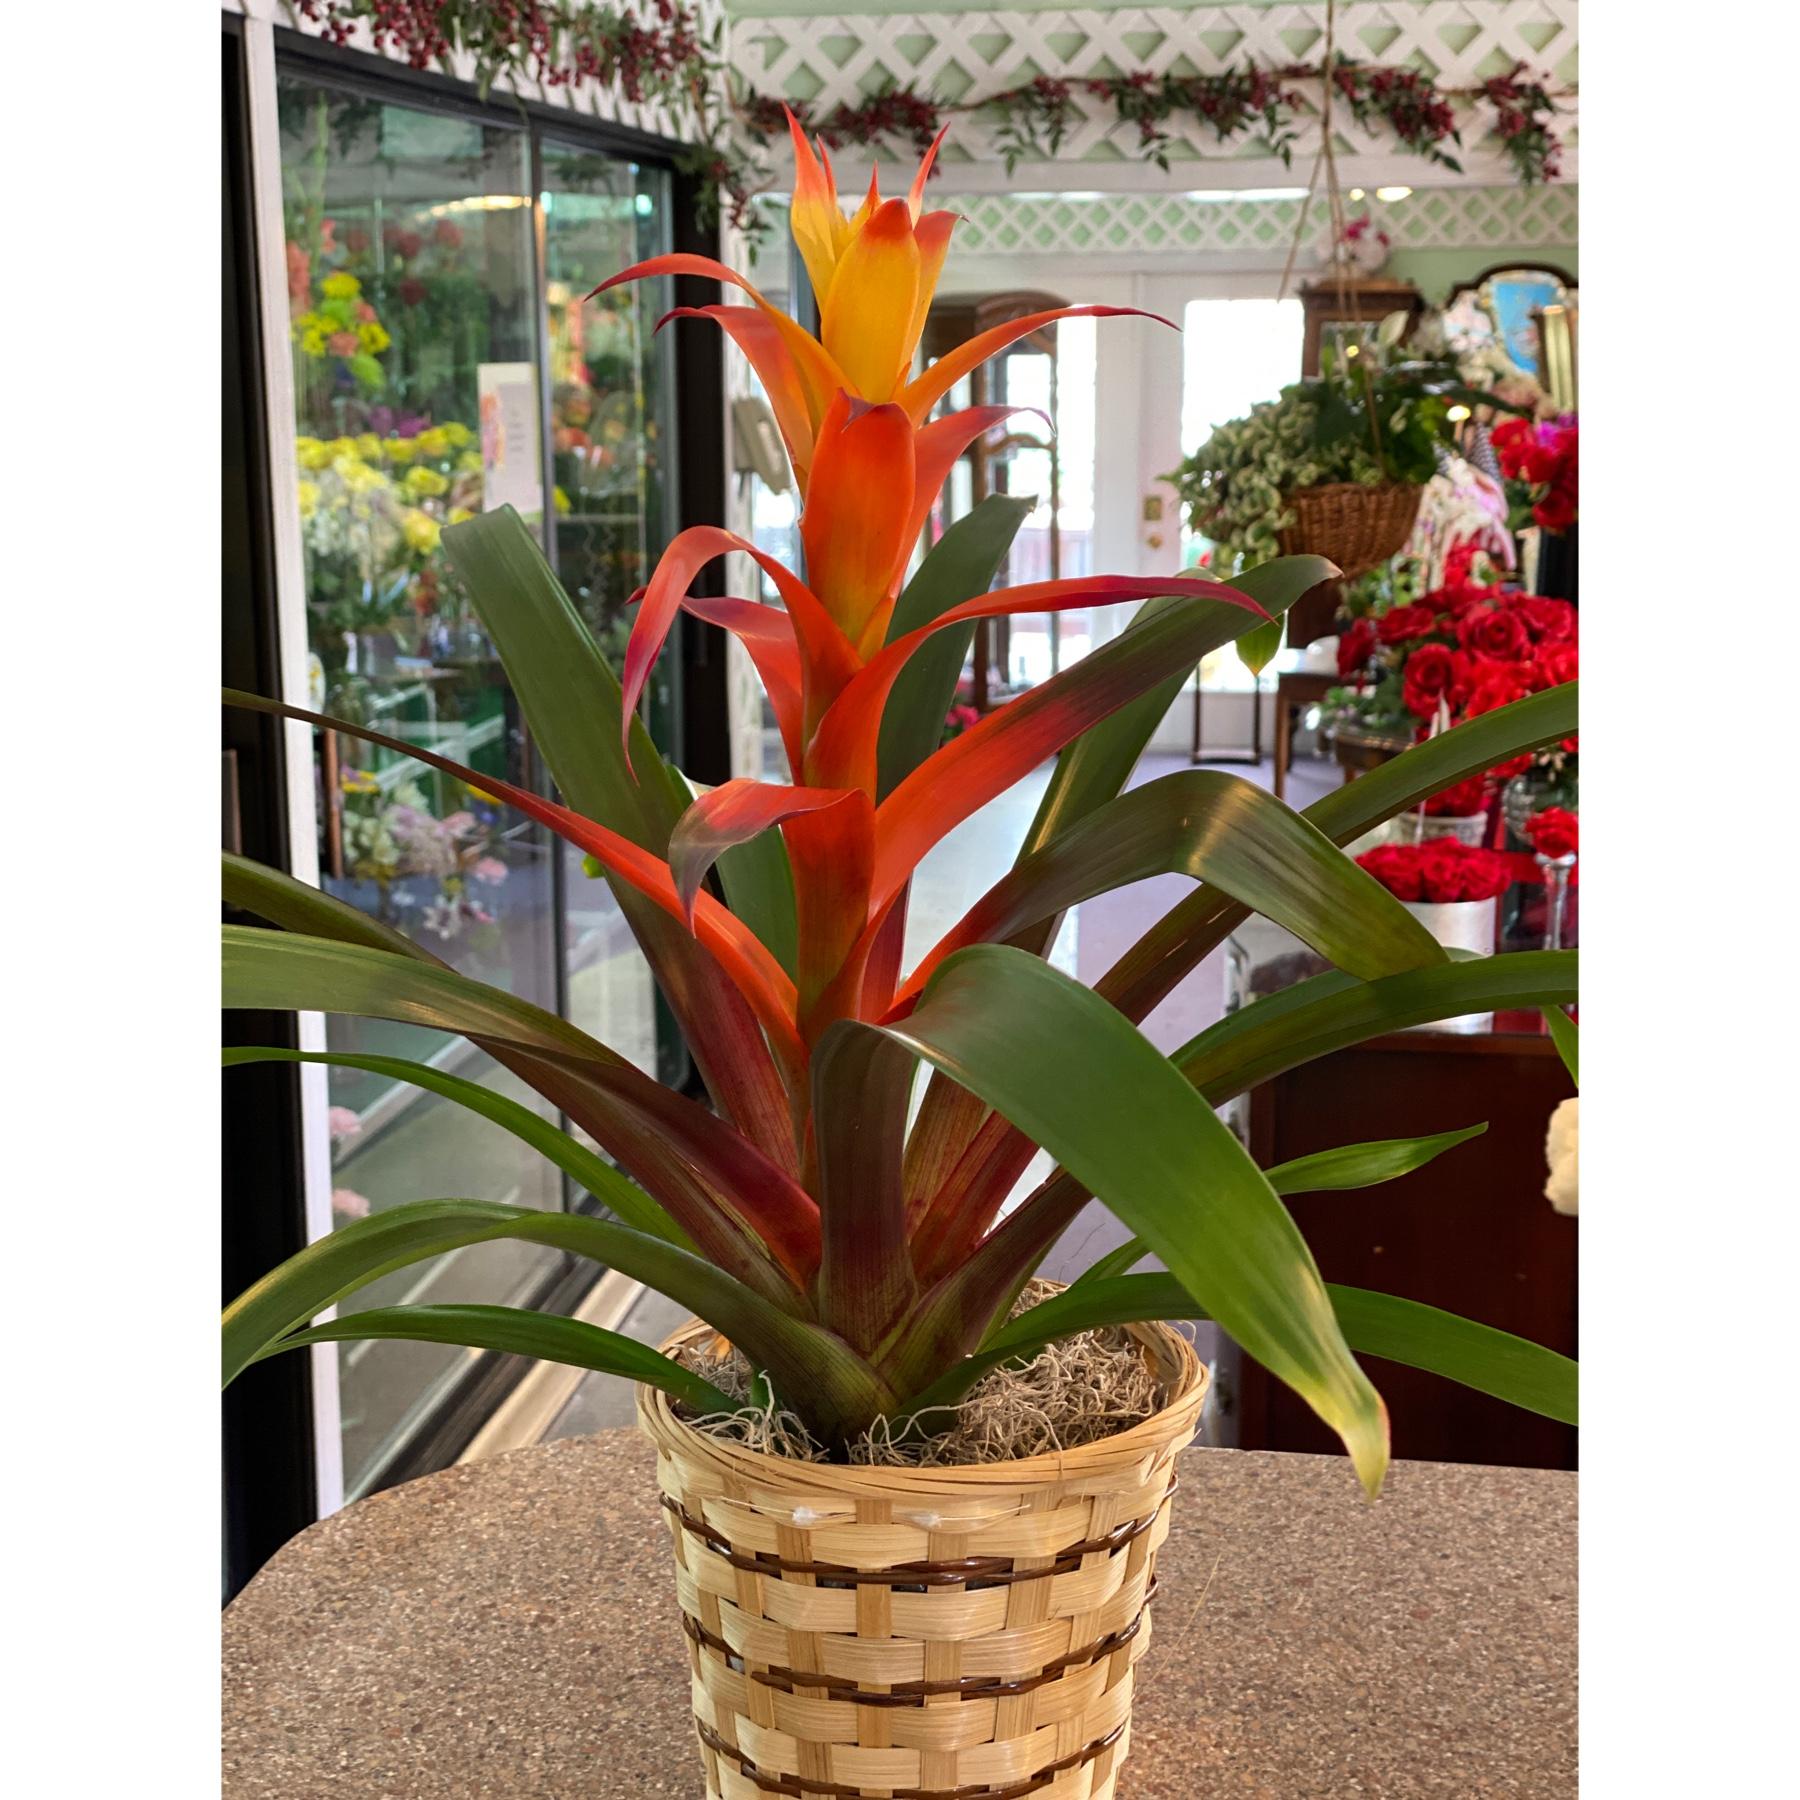 DiBella Flowers & Gifts Las Vegas - Fiery sunset bromeliad in a basket